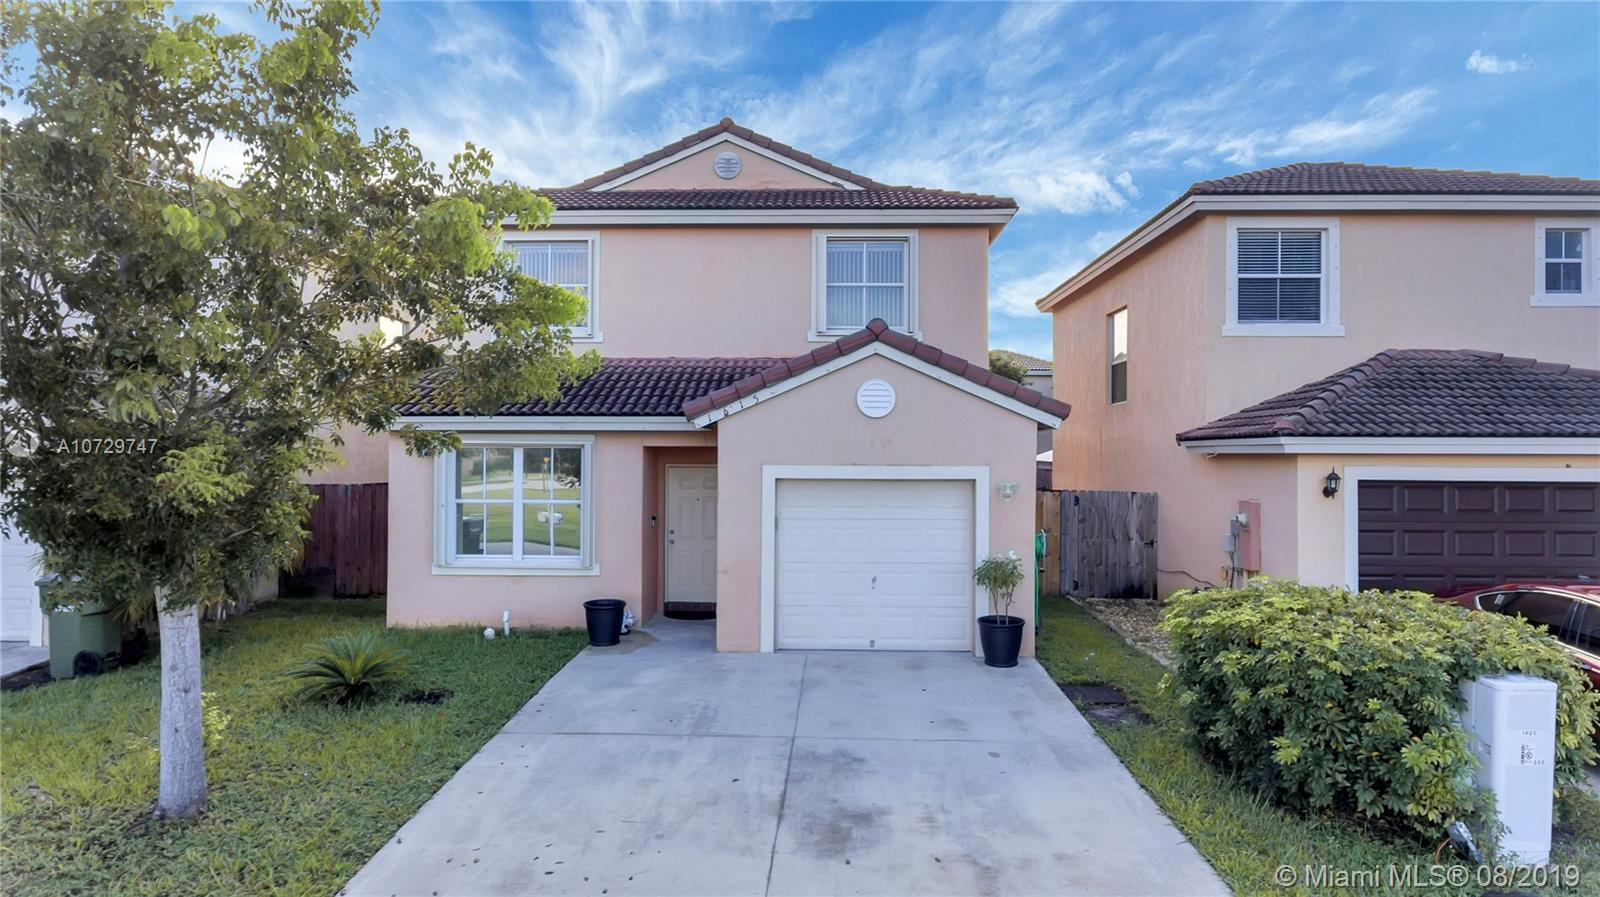 1615 SE 20th Ter, Homestead, FL 33035 - Homestead, FL real estate listing